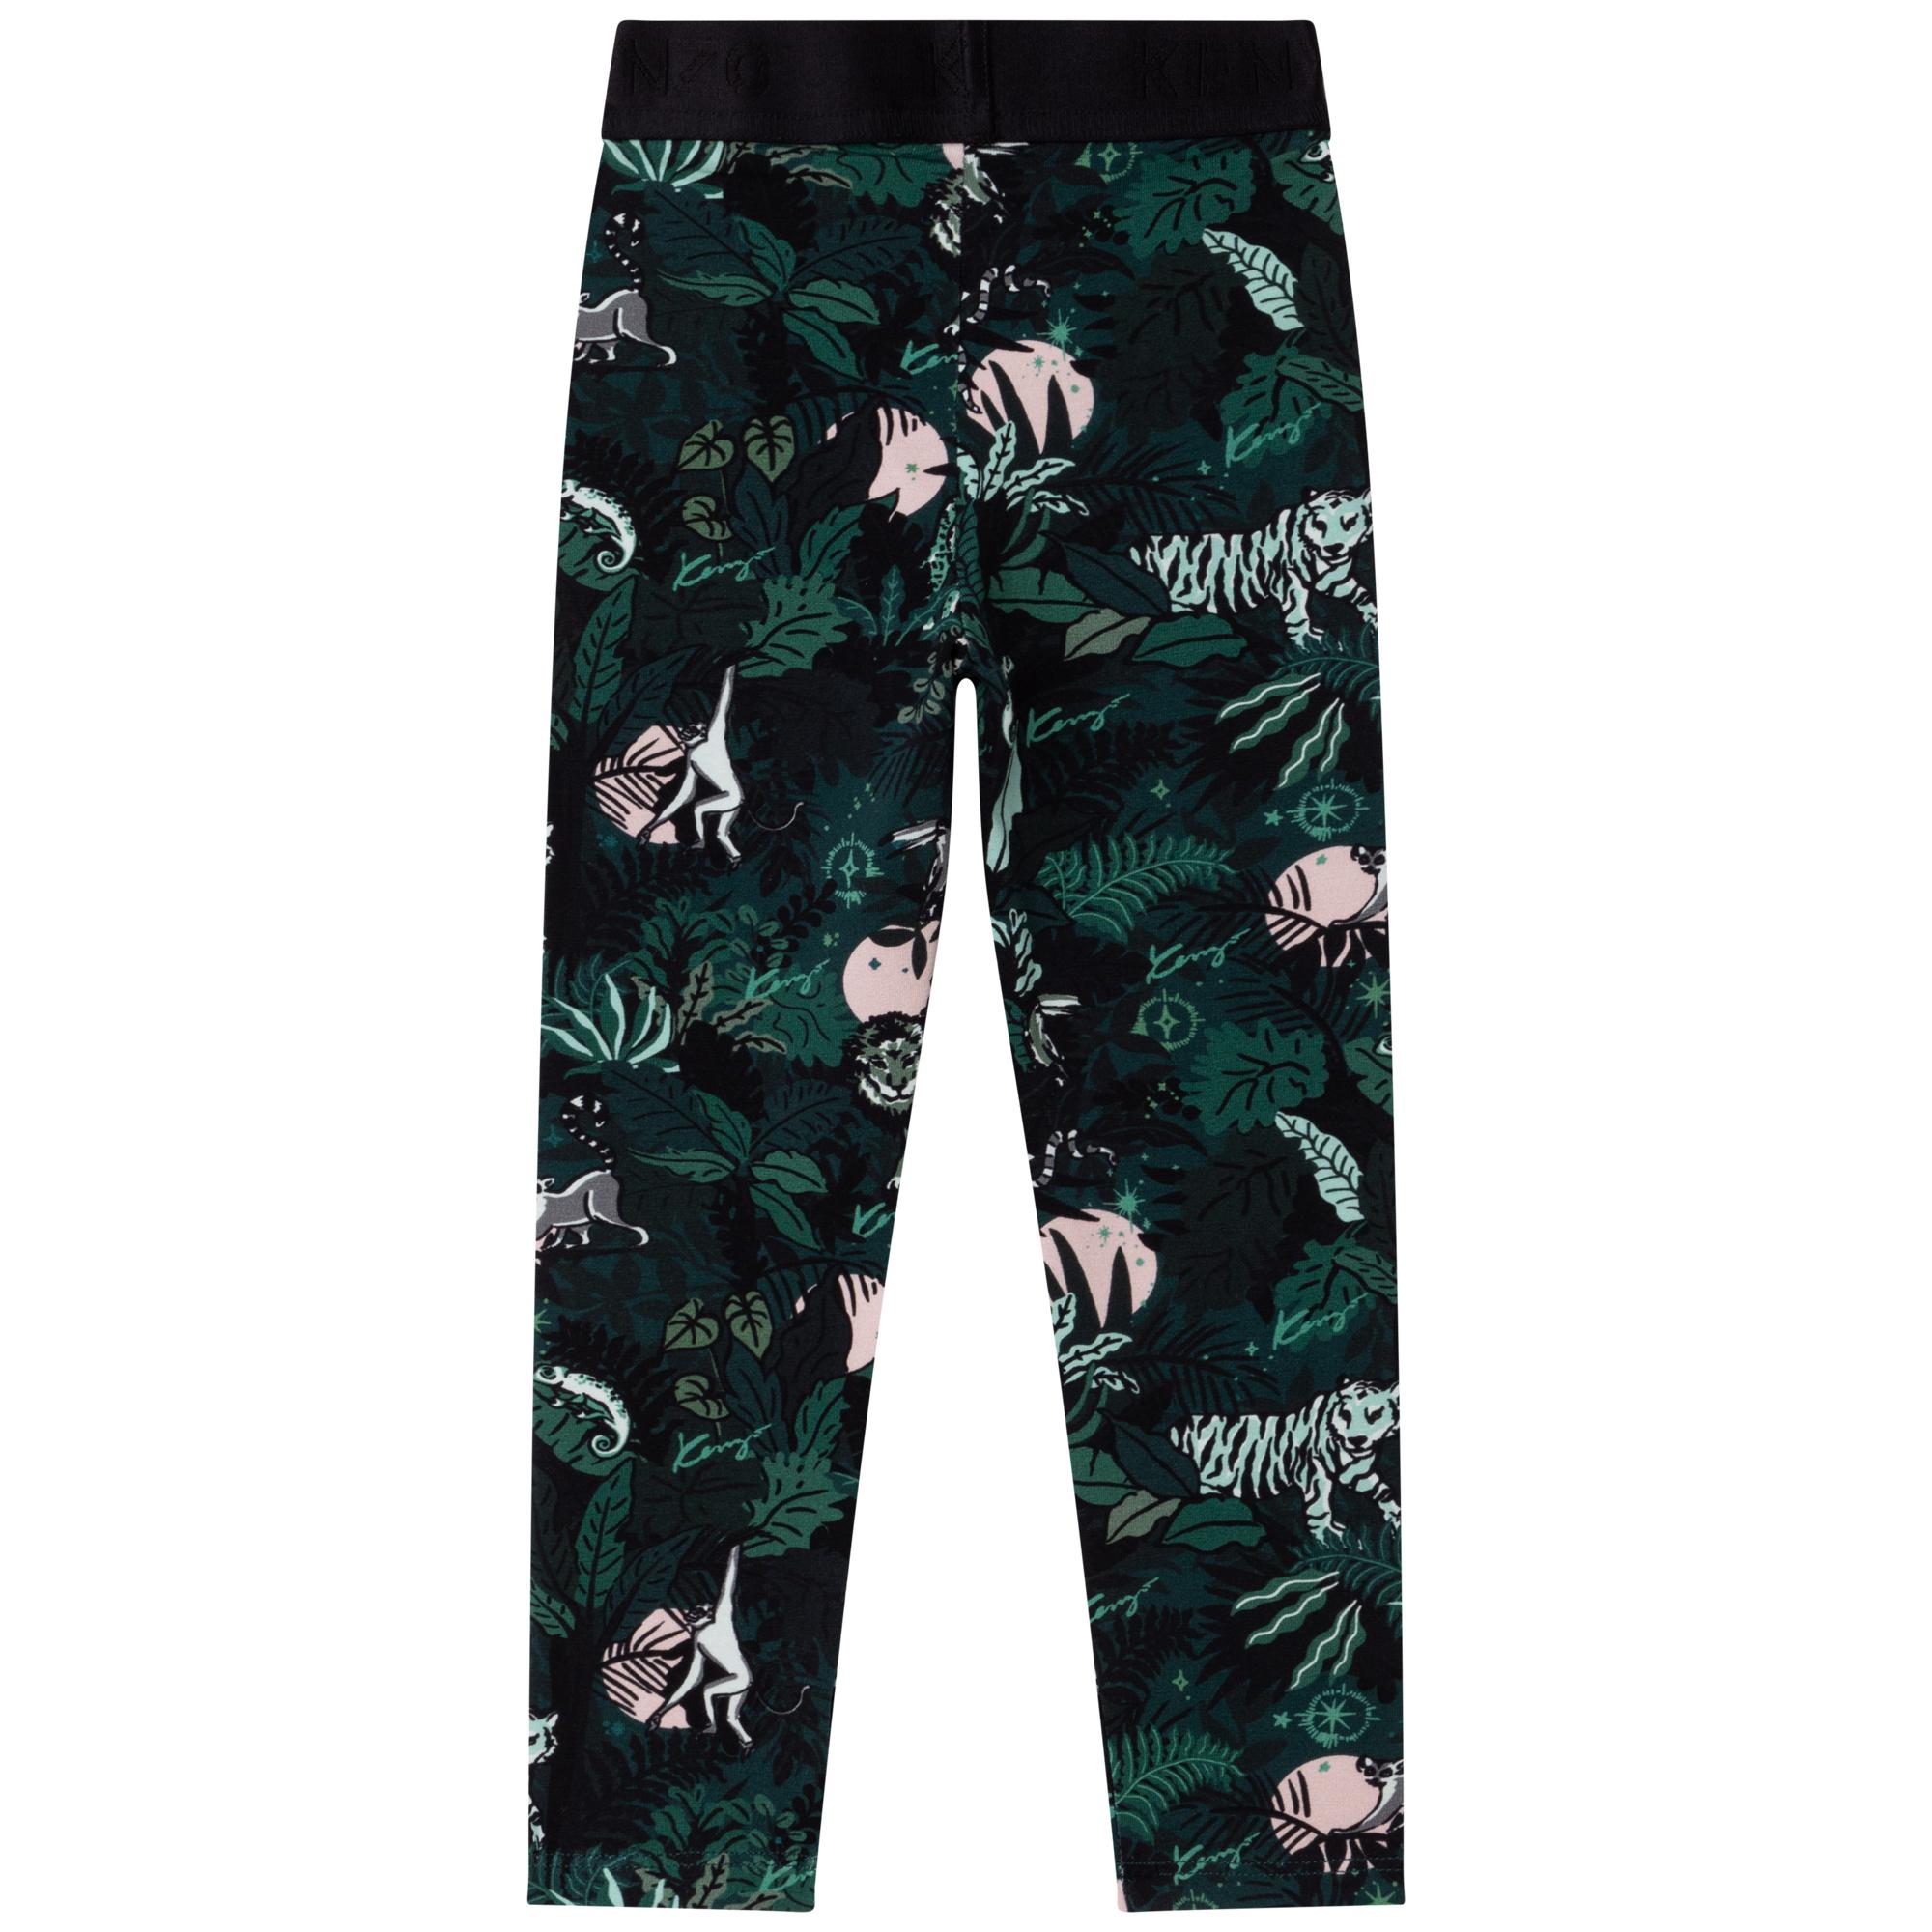 Printed cotton leggings KENZO KIDS for GIRL